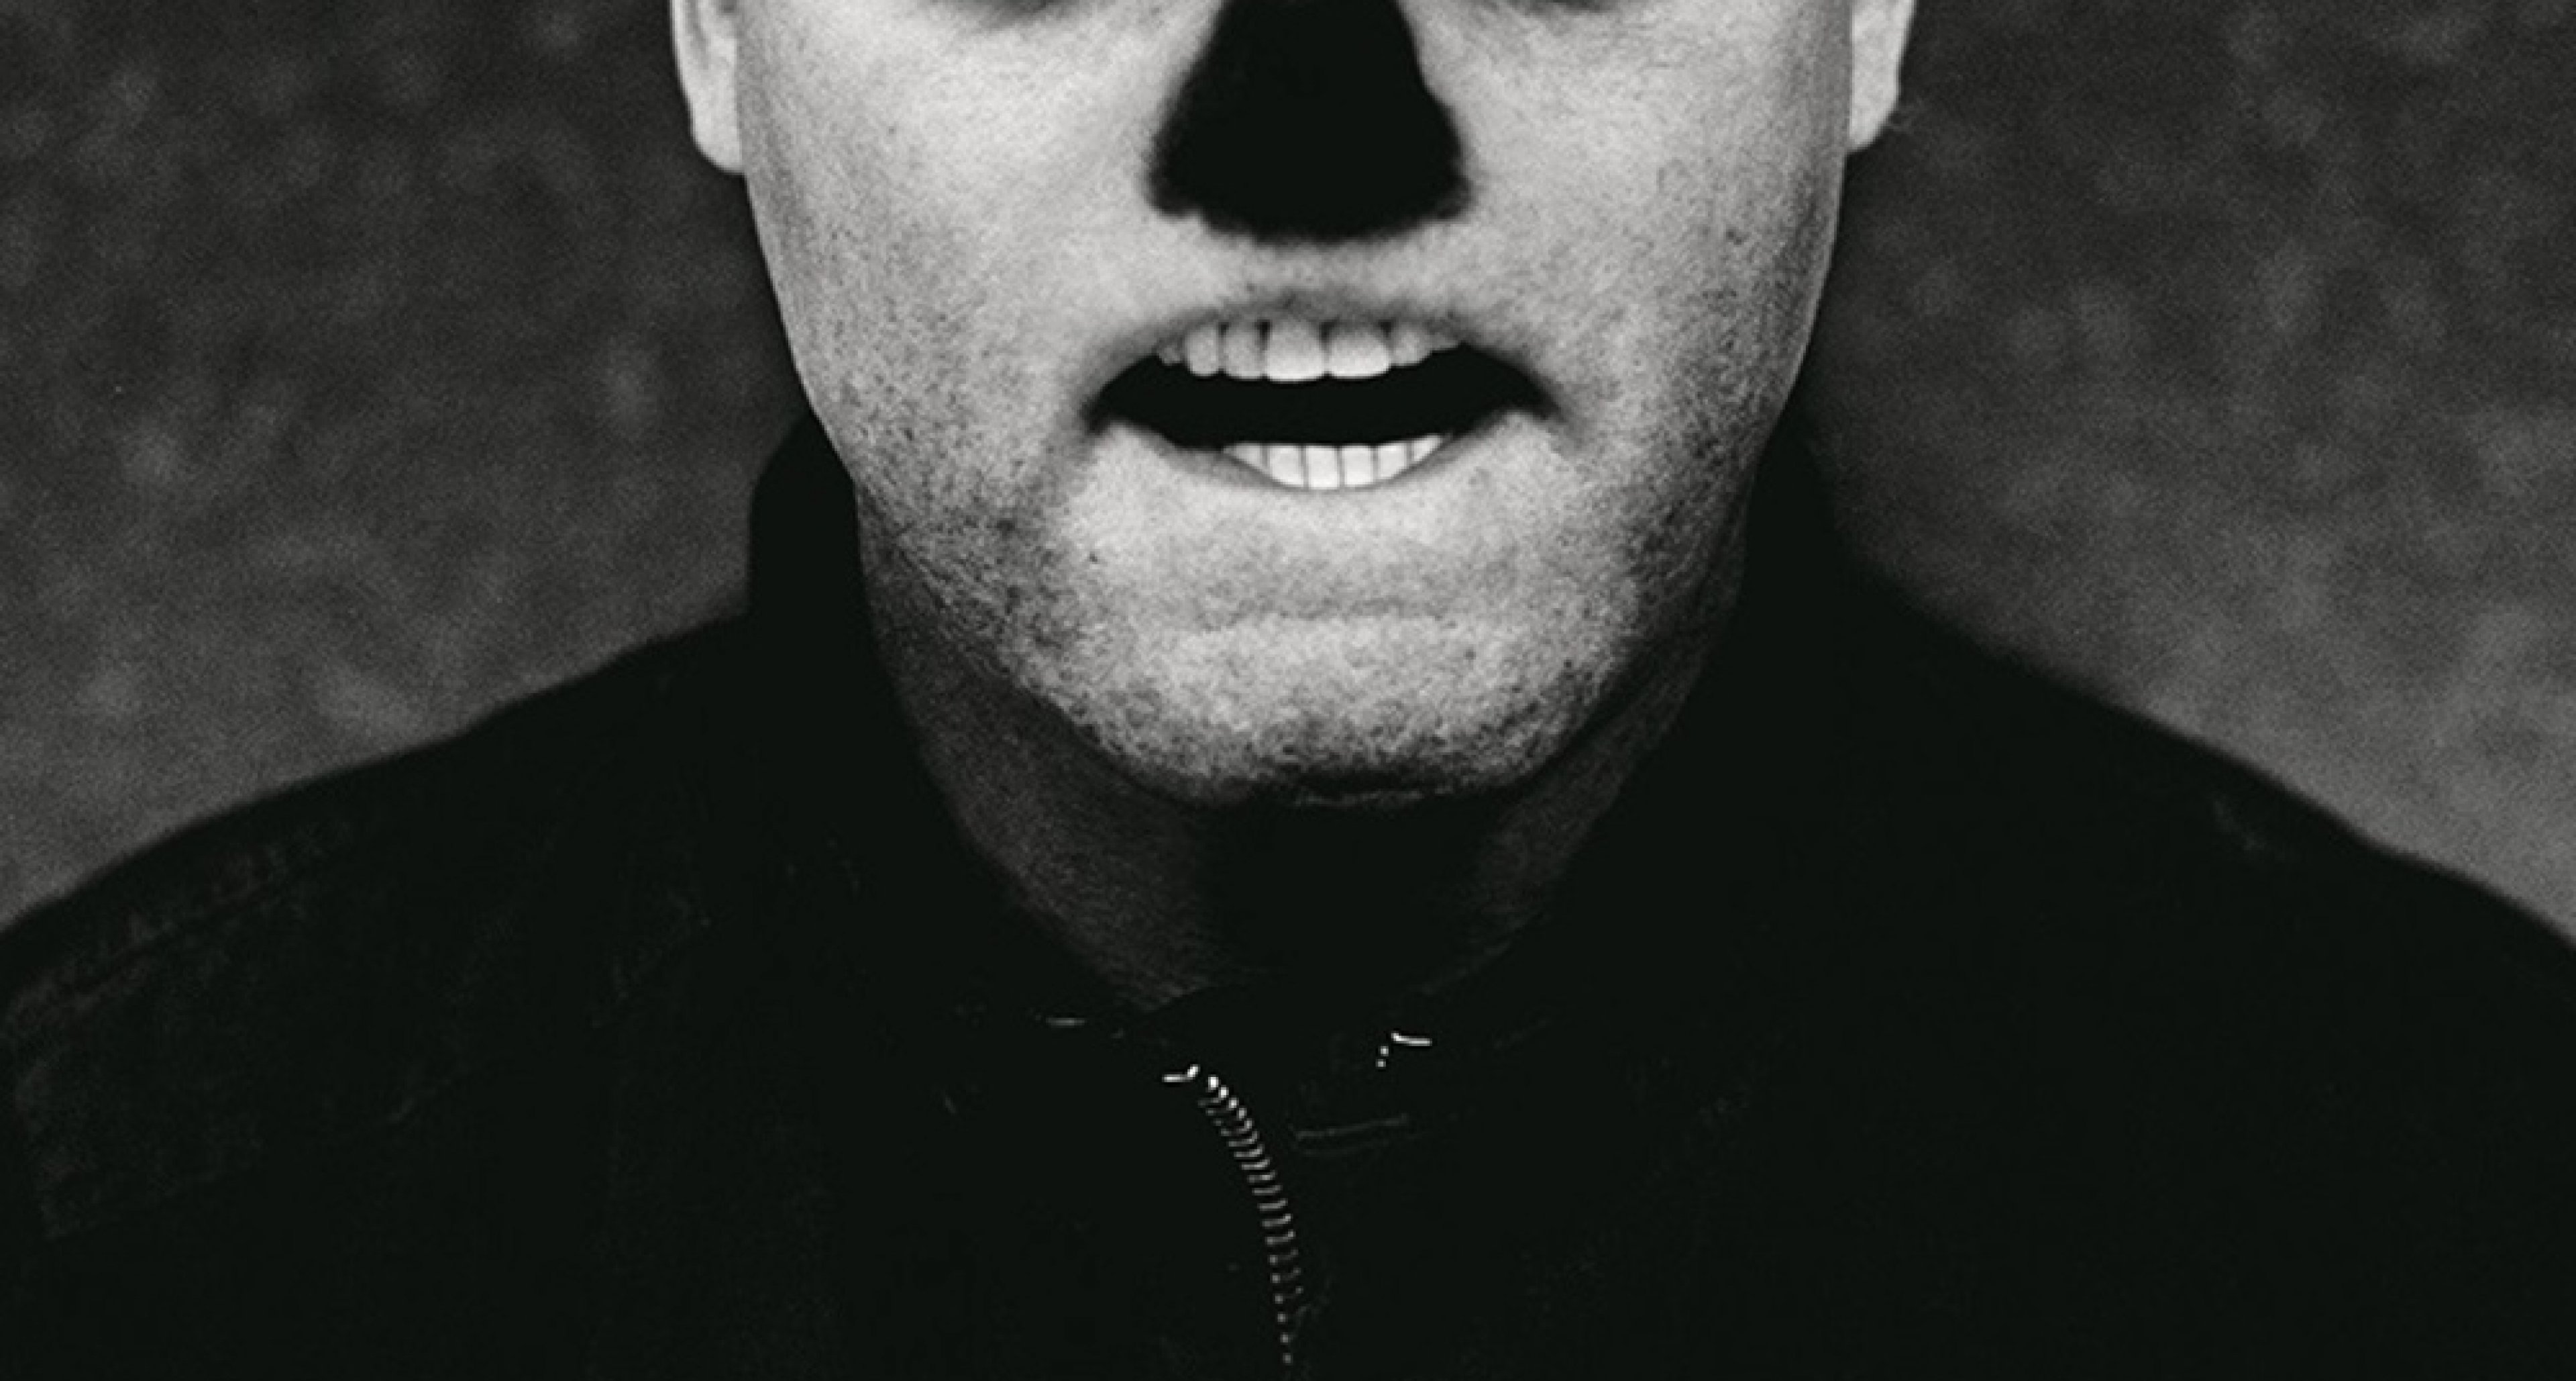 Damien Hirst by Anton Corbijn, 2011 © Anton Corbijn